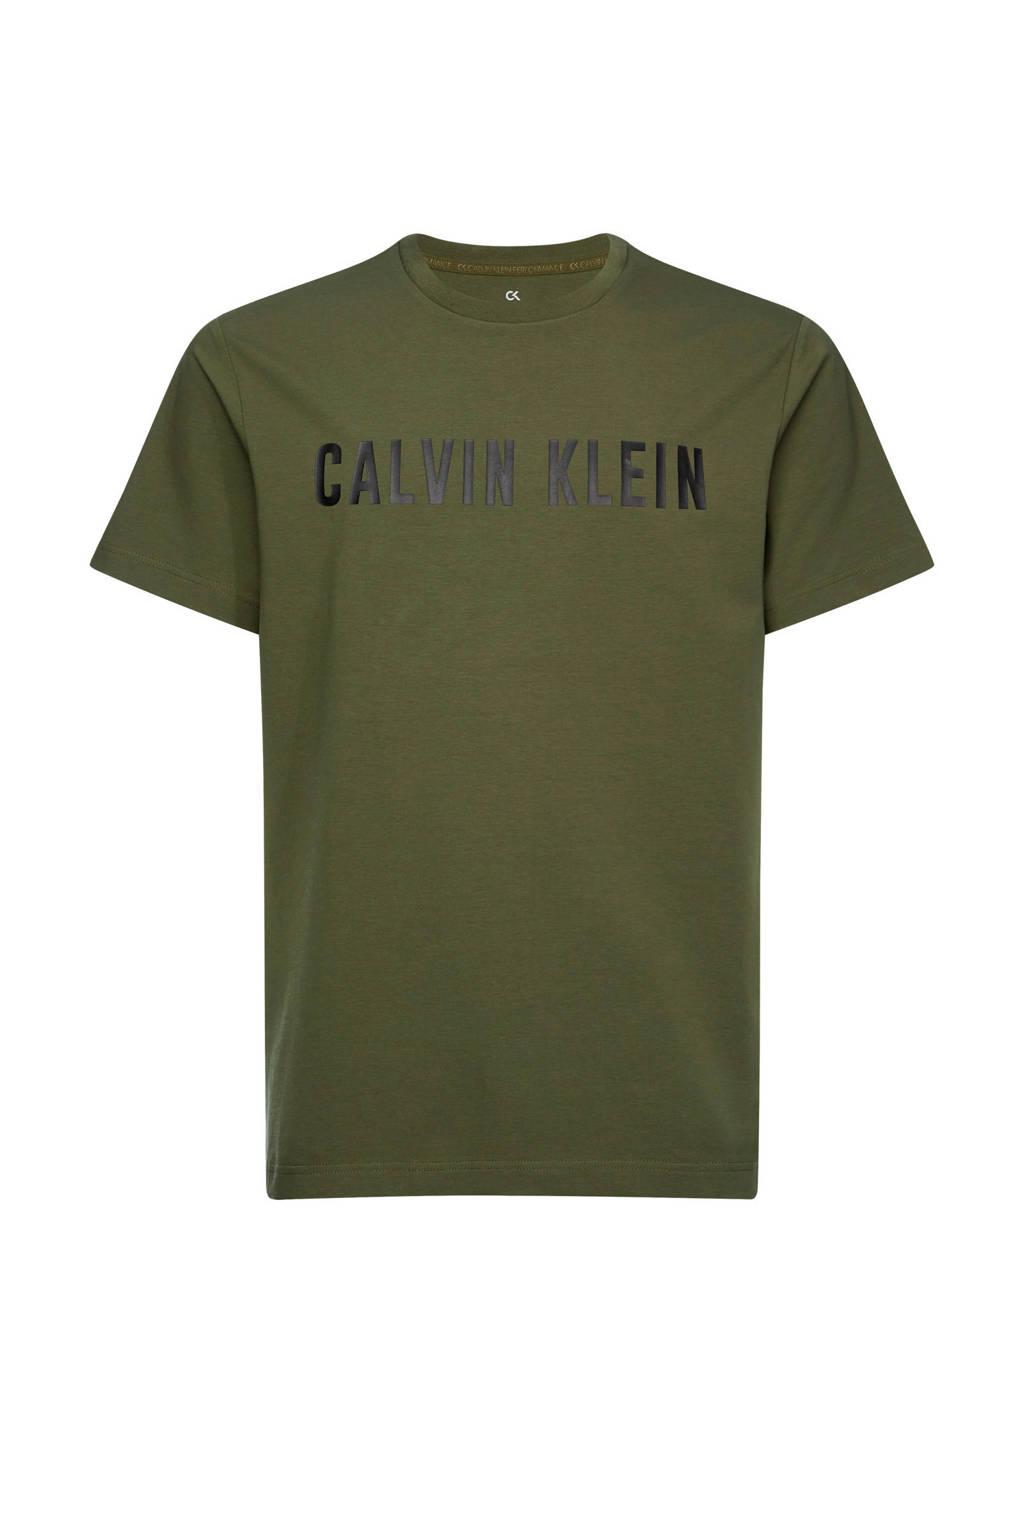 CALVIN KLEIN PERFORMANCE   T-shirt kaki, Kaki